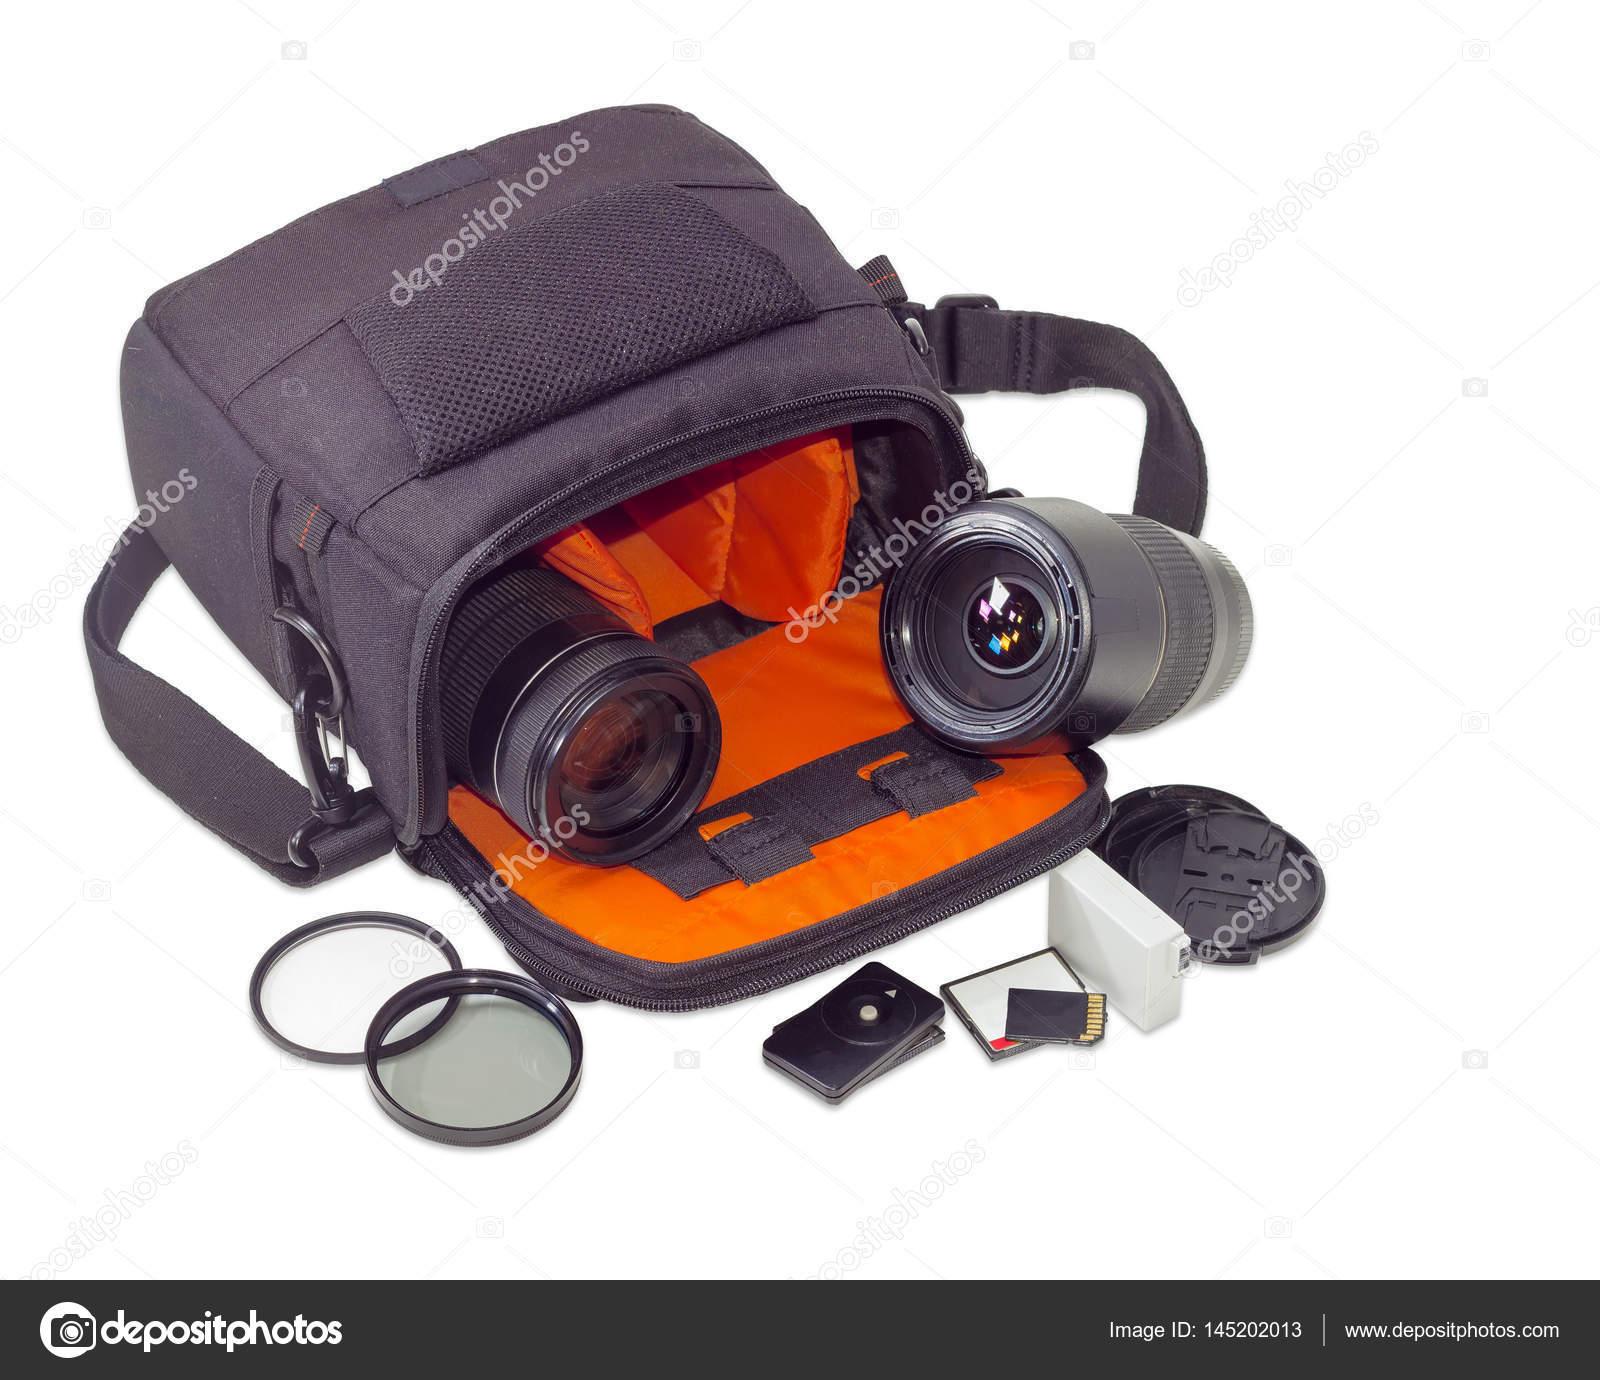 e1f8e5eefd Δύο διαφορετικές Φωτογραφικοί φακοί σε ανοιχτή κάμερα τσάντα και κάποια  άλλα εξαρτήματα φωτογραφία δίπλα σε ανοιχτόχρωμο φόντο — Εικόνα από ...